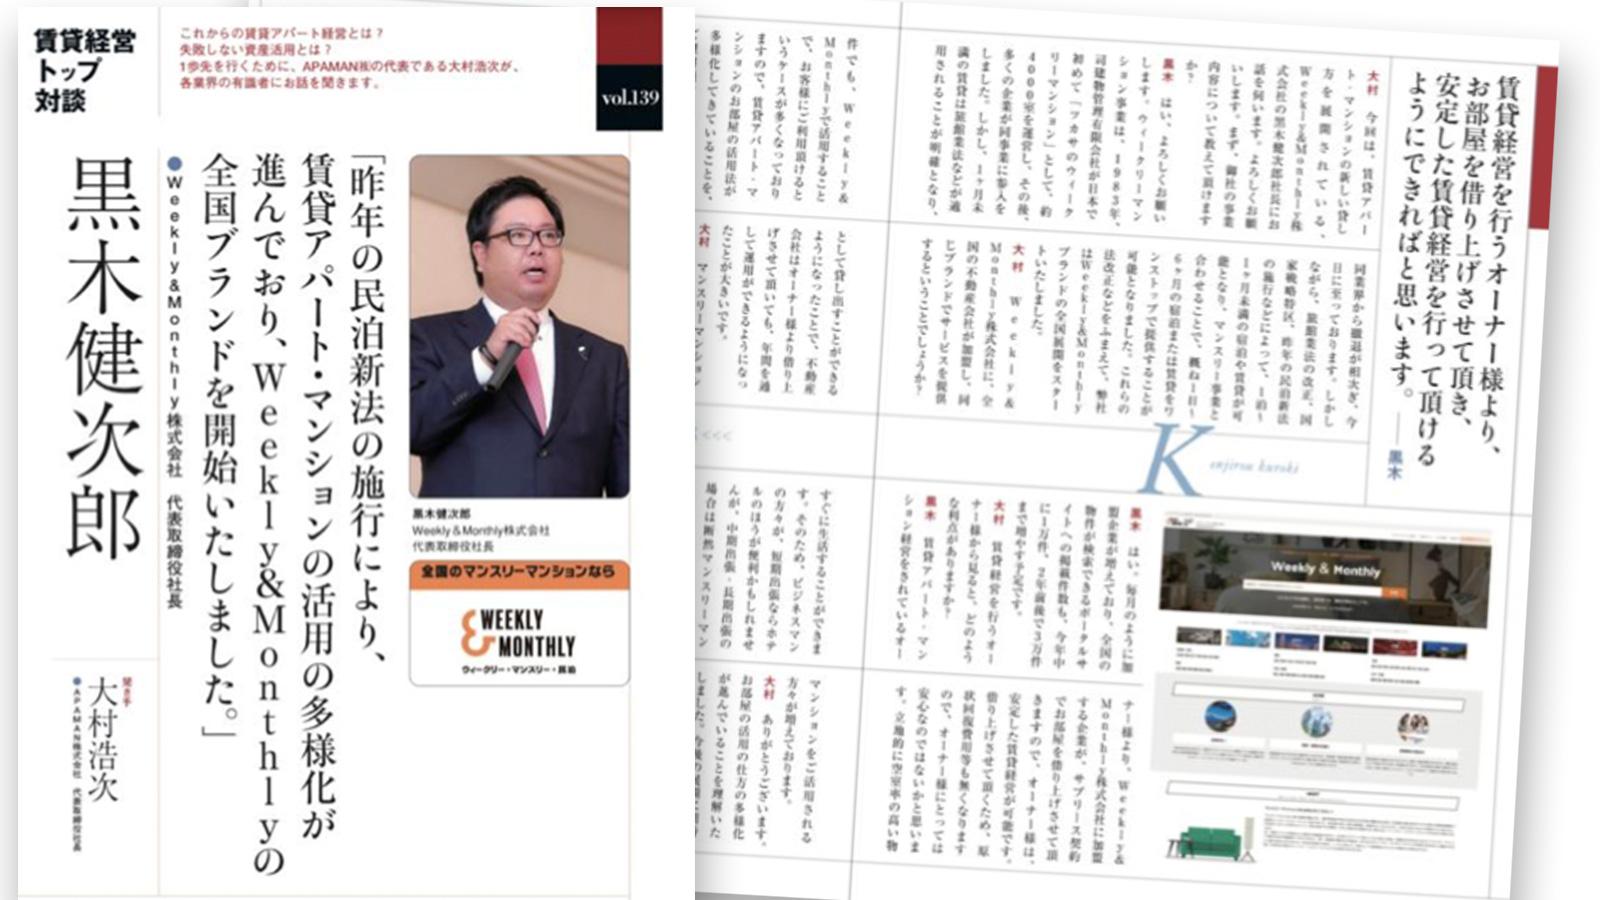 【PR】【メディア掲載】グローバルオーナーズに当社代表黒木の対談記事を掲載いただきました